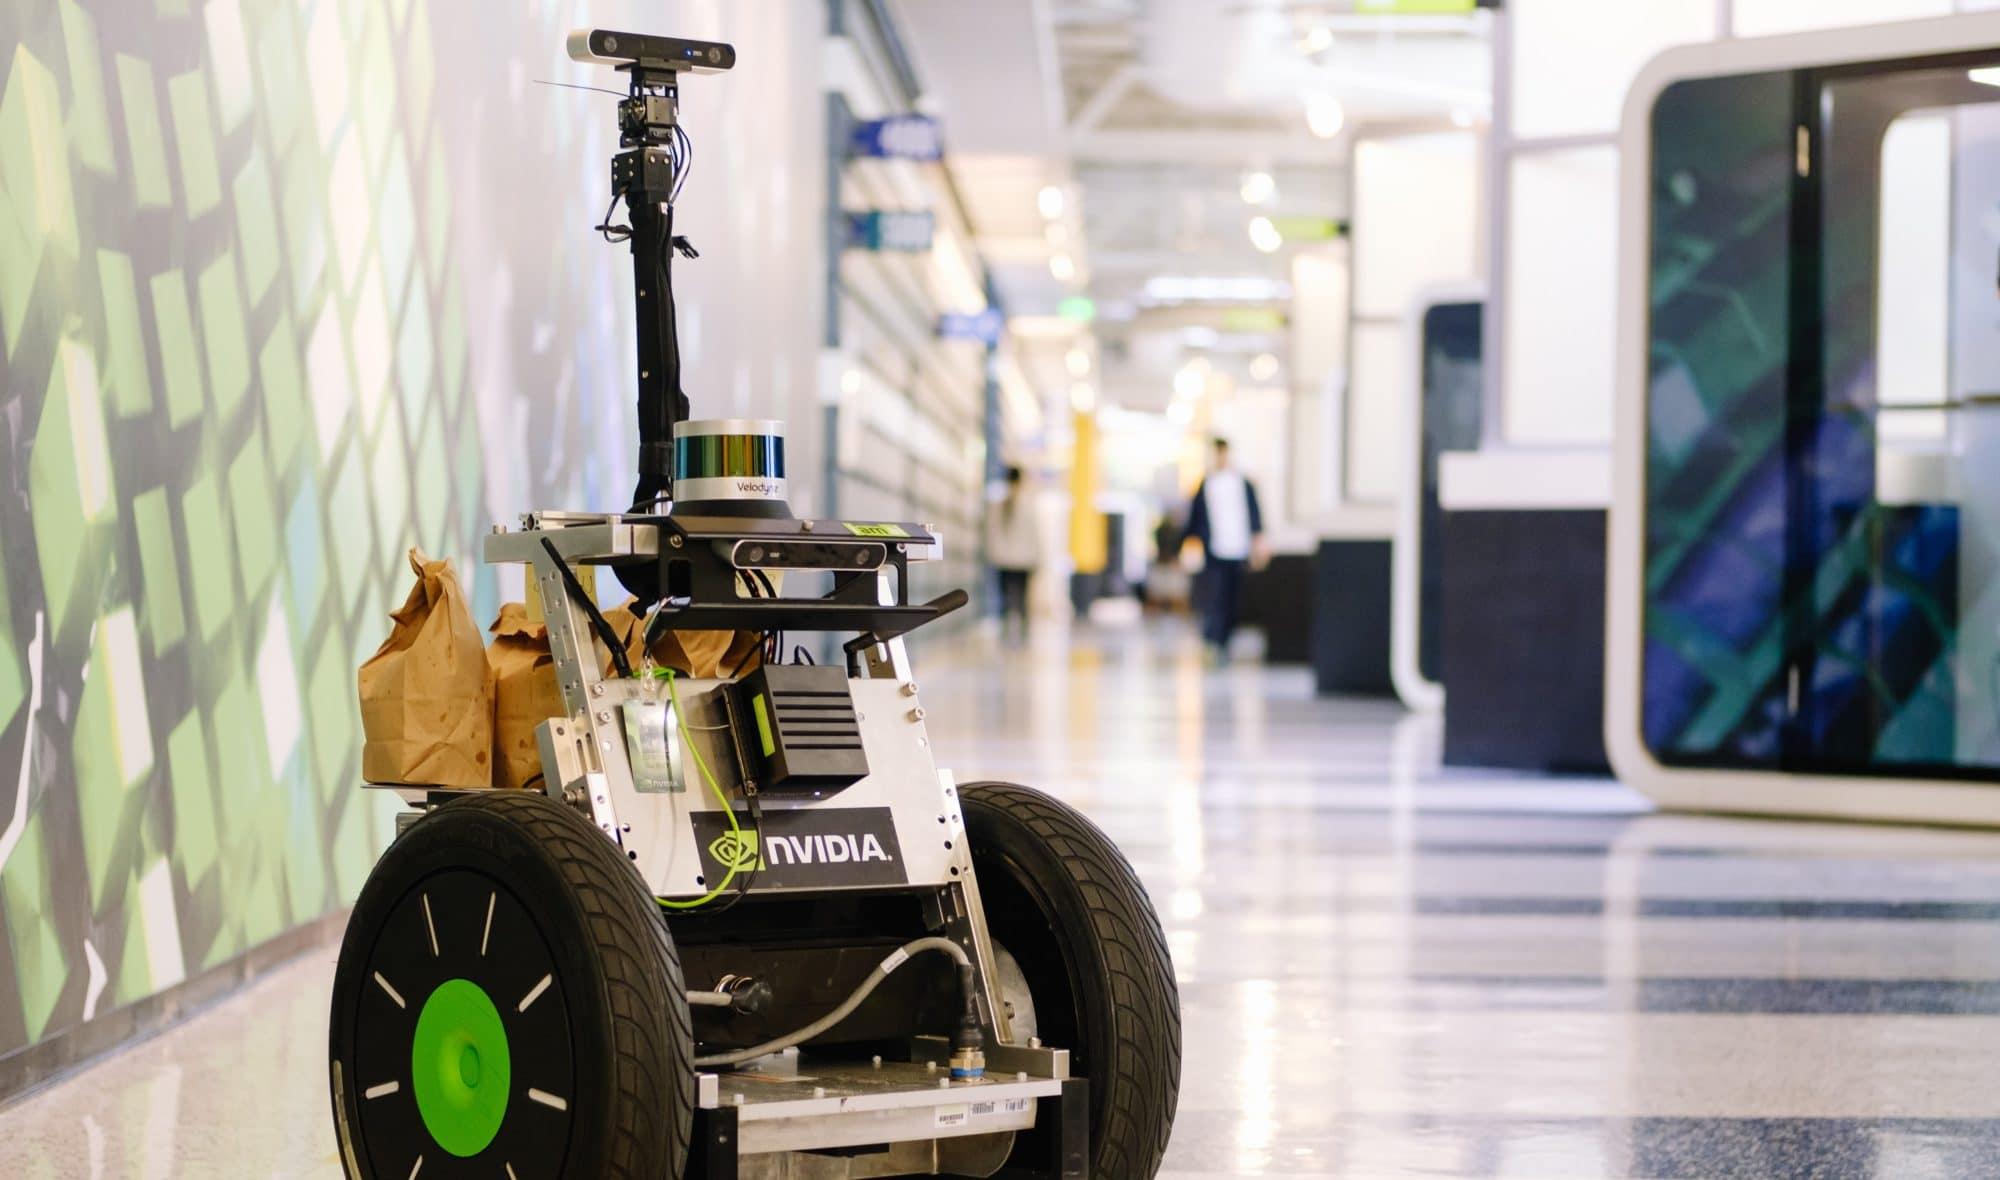 Popcorn Delivery Robot Bears Kernel Innovation | NVIDIA Blog